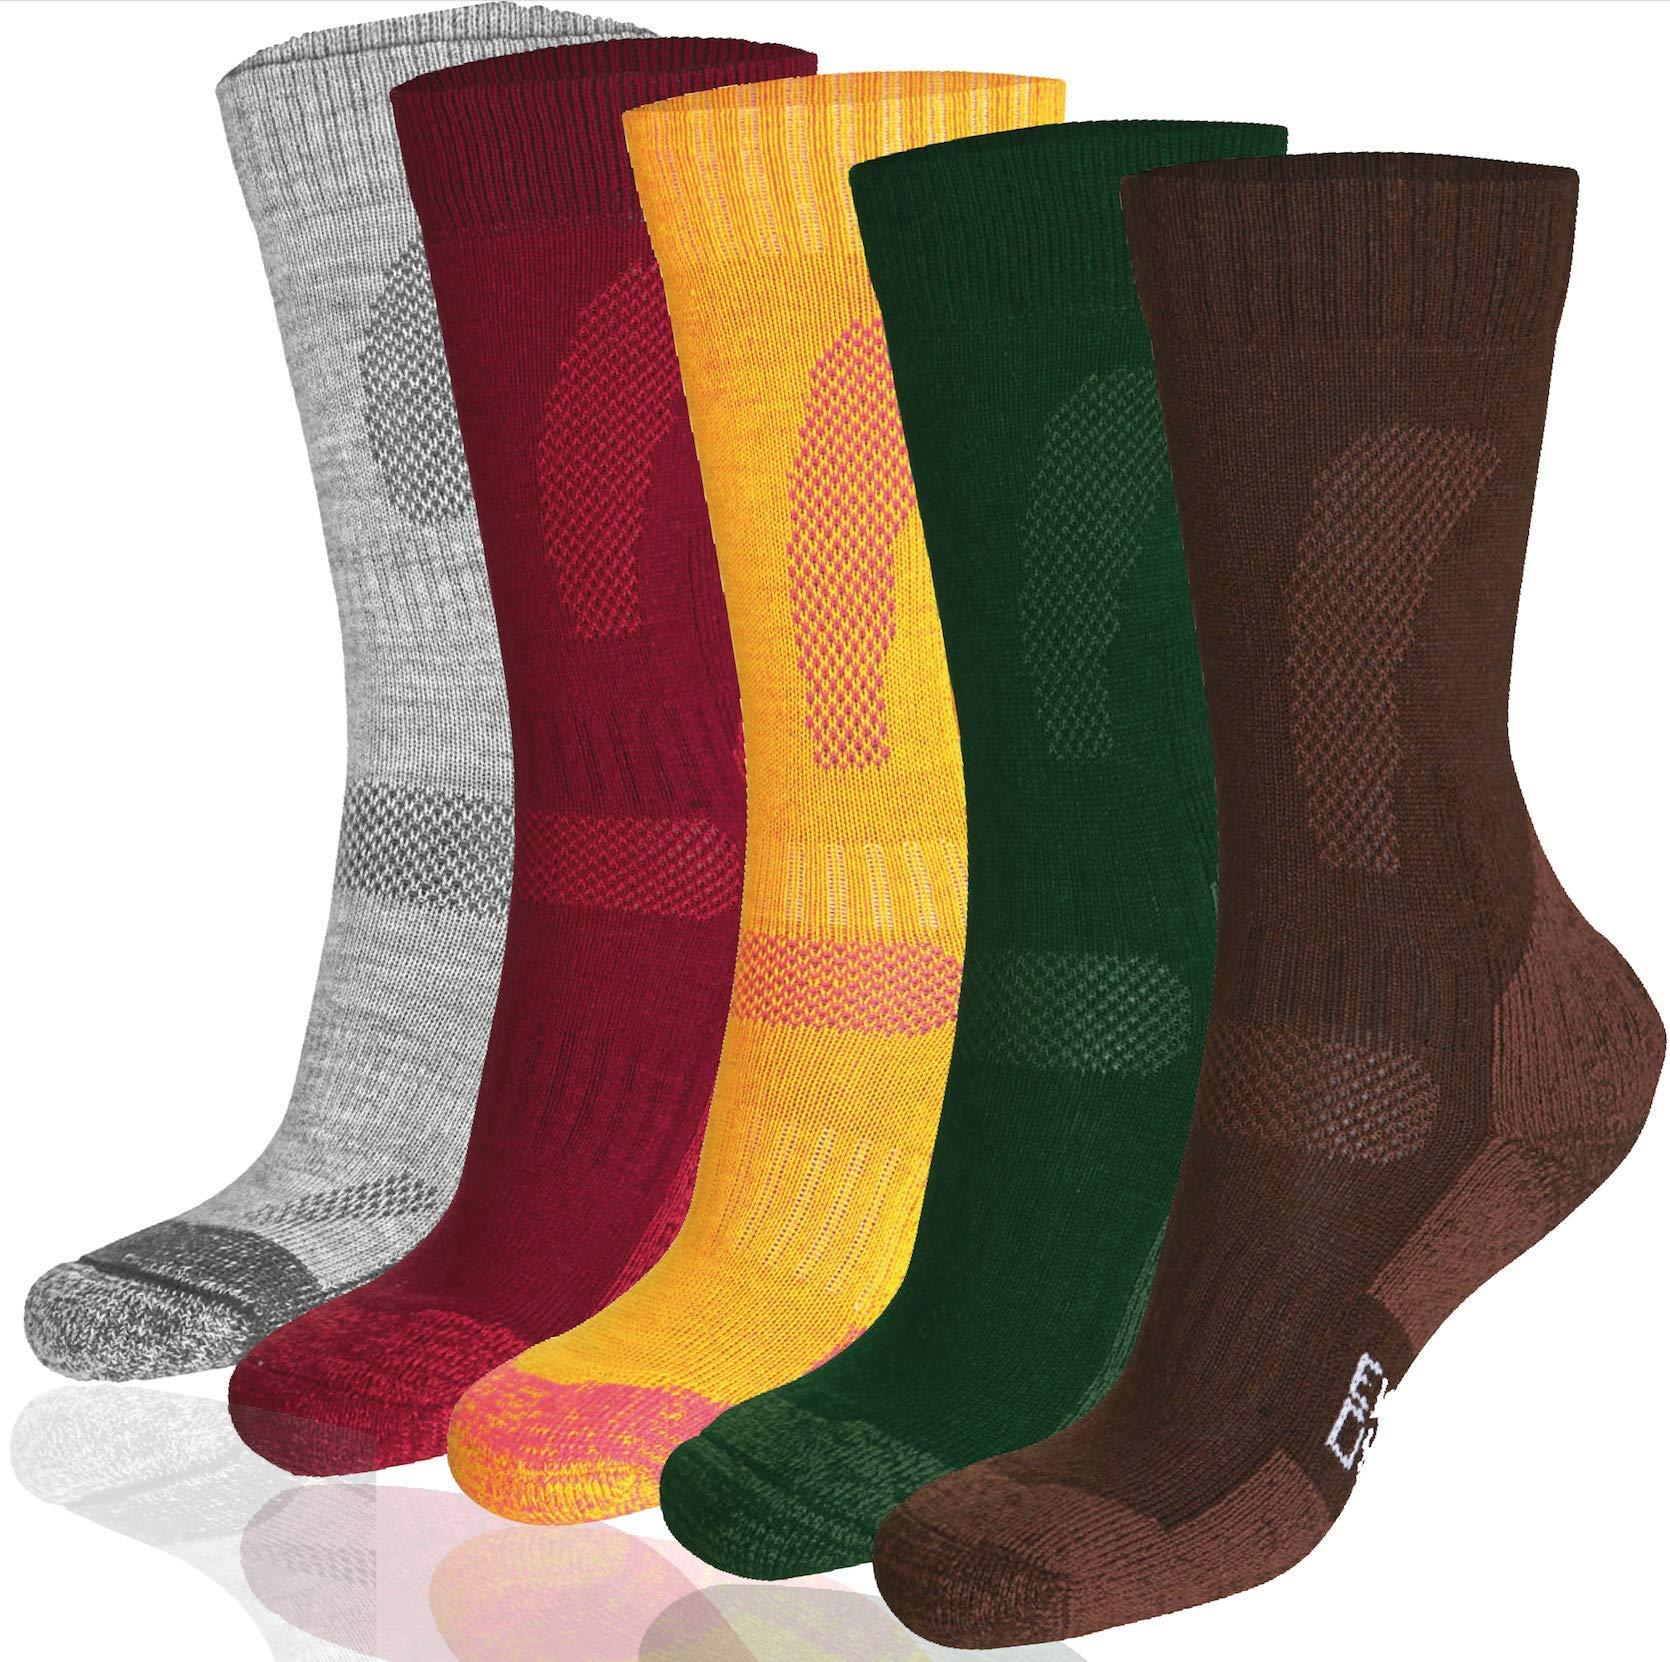 DANISH ENDURANCE Merino Wool Hiking & Trekking Socks (Multicolor: Brown, Red, Green 3 Pairs, US Women 8-10 // US Men 6.5-8.5)